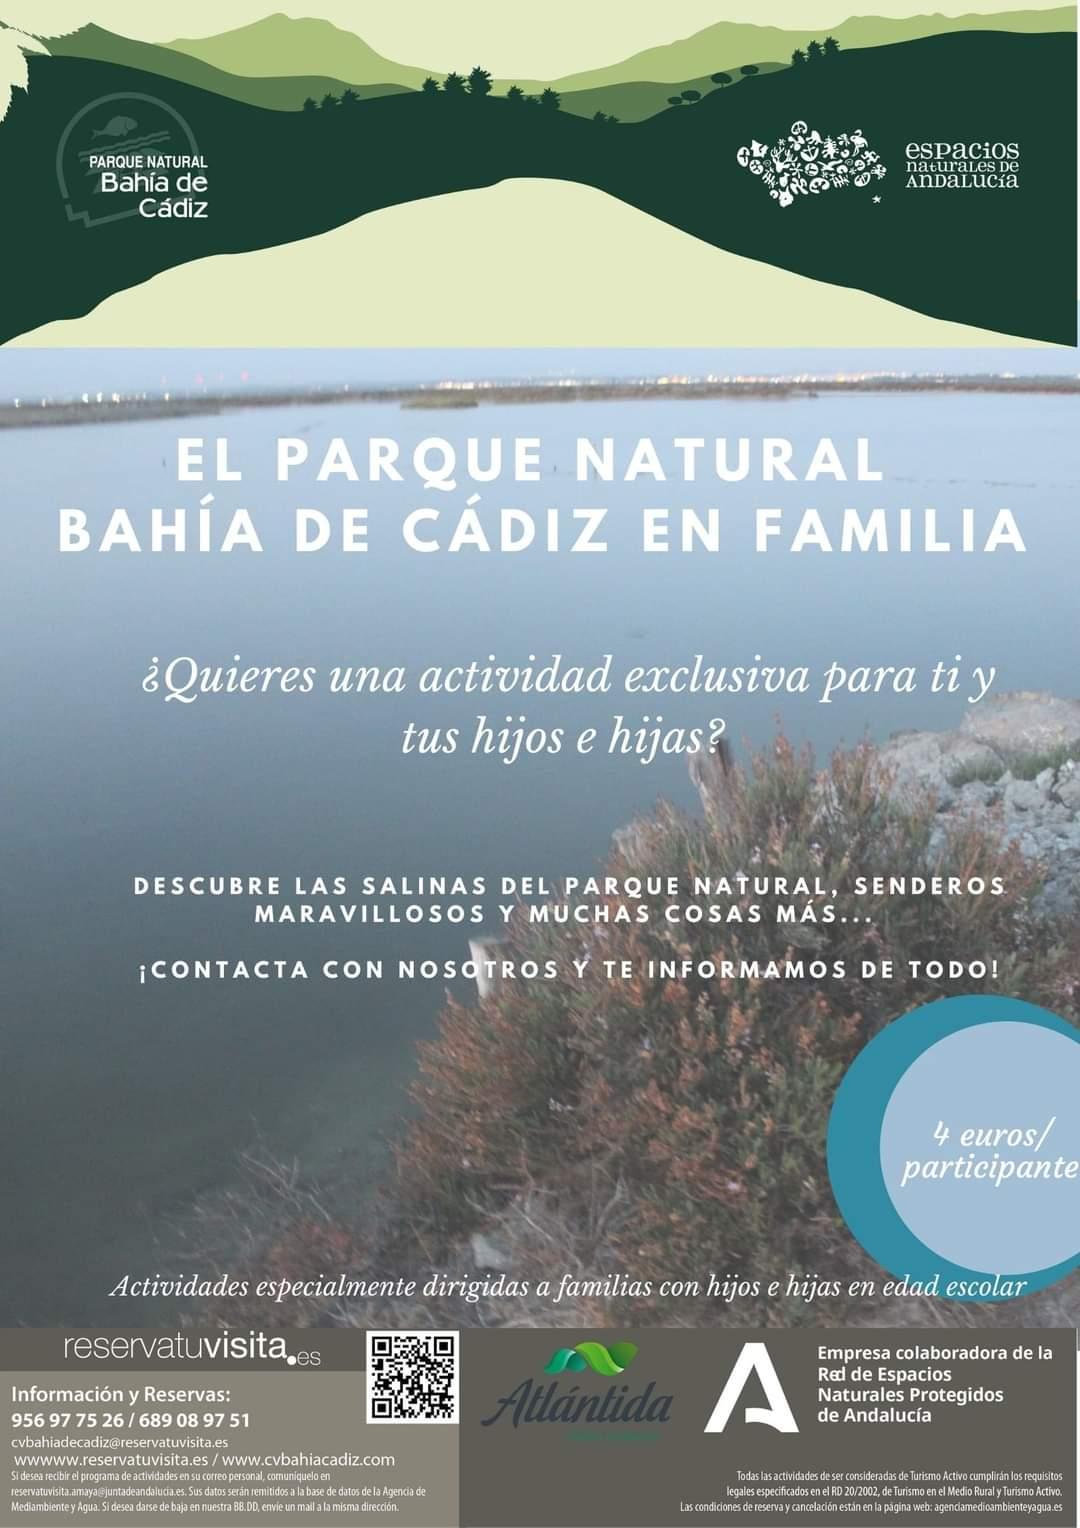 parque natural bahia de cadiz en familia otoño 2020